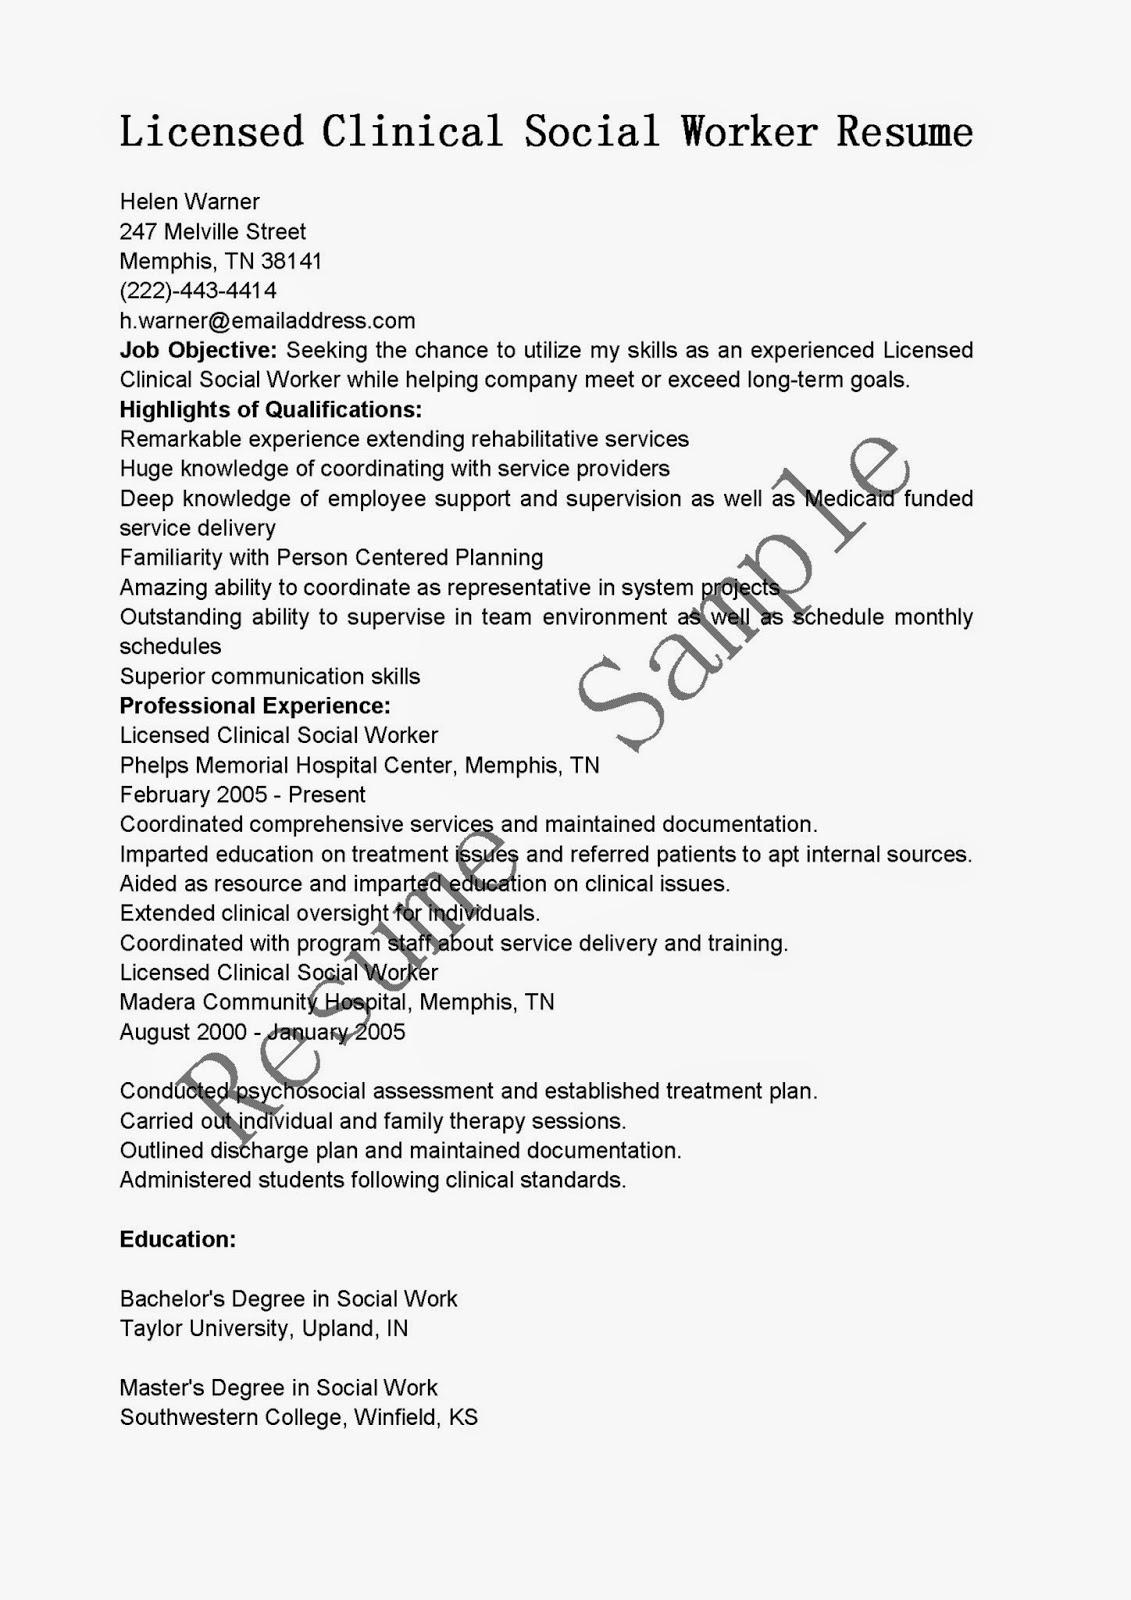 resume samples  licensed clinical social worker resume sample